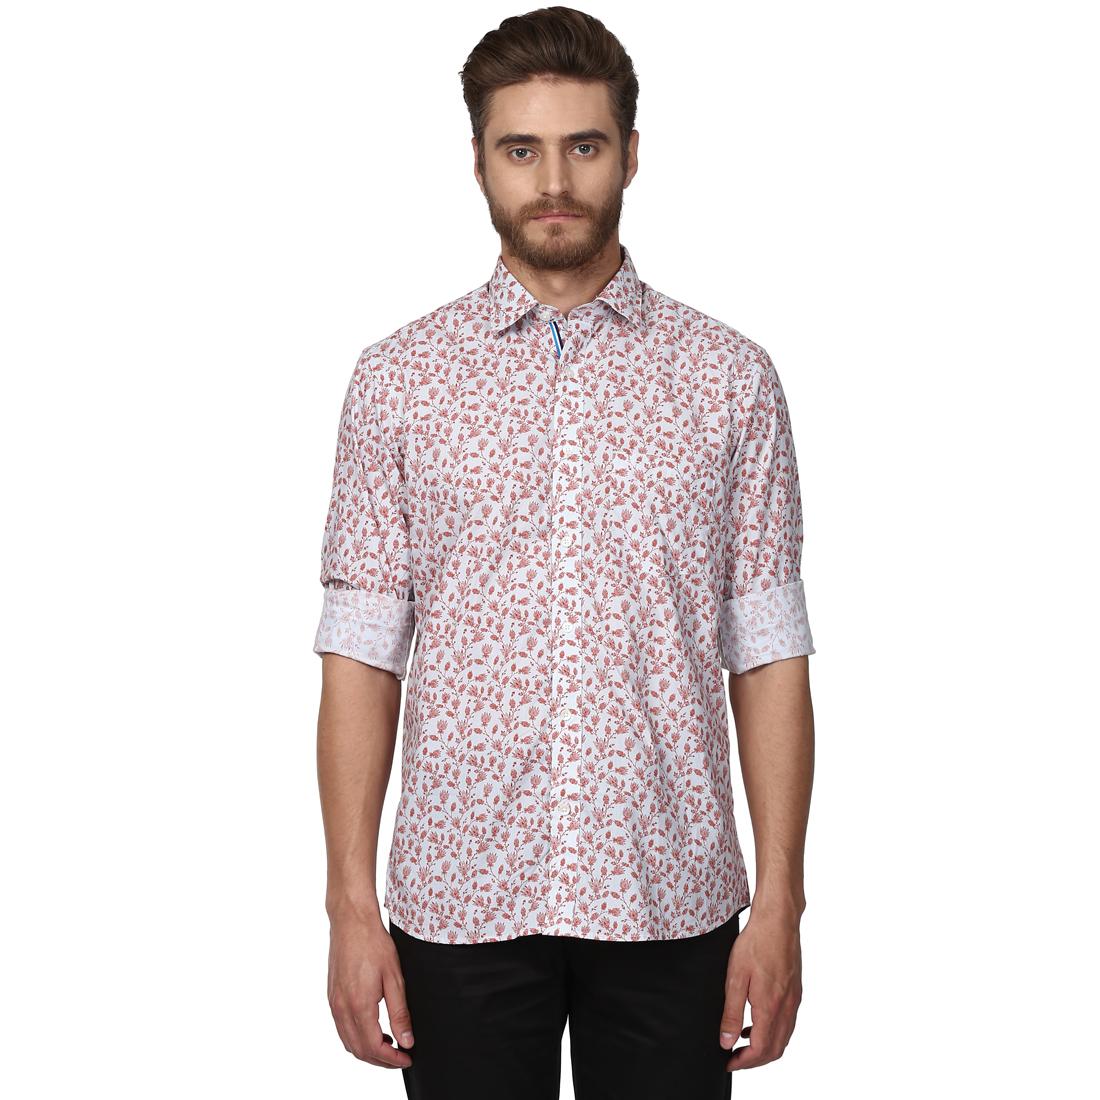 ColorPlus | ColorPlus Medium Red Tailored Fit Shirts